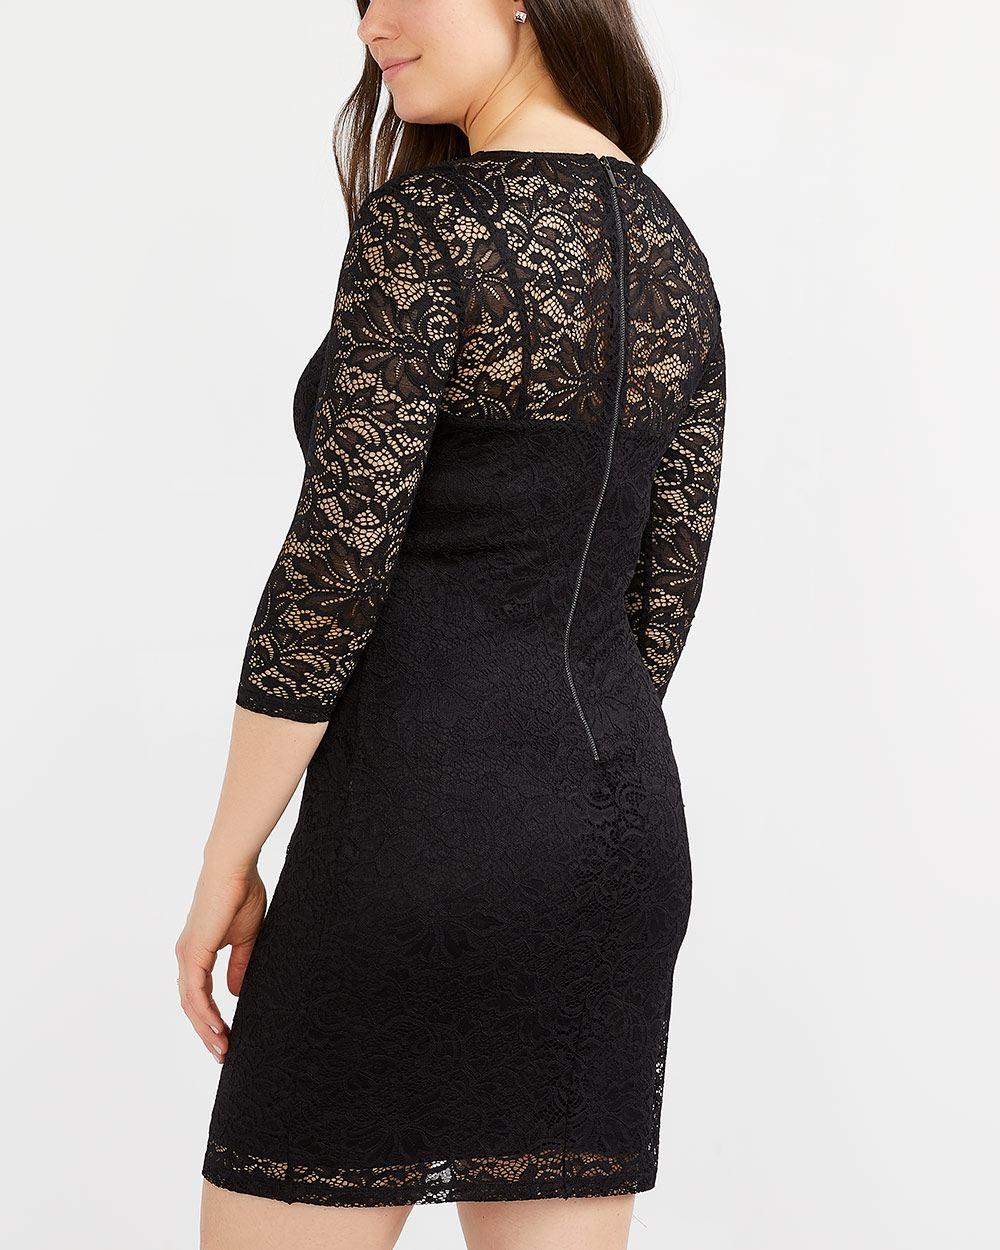 a99ba1c37a17 Lace Bodycon Dress